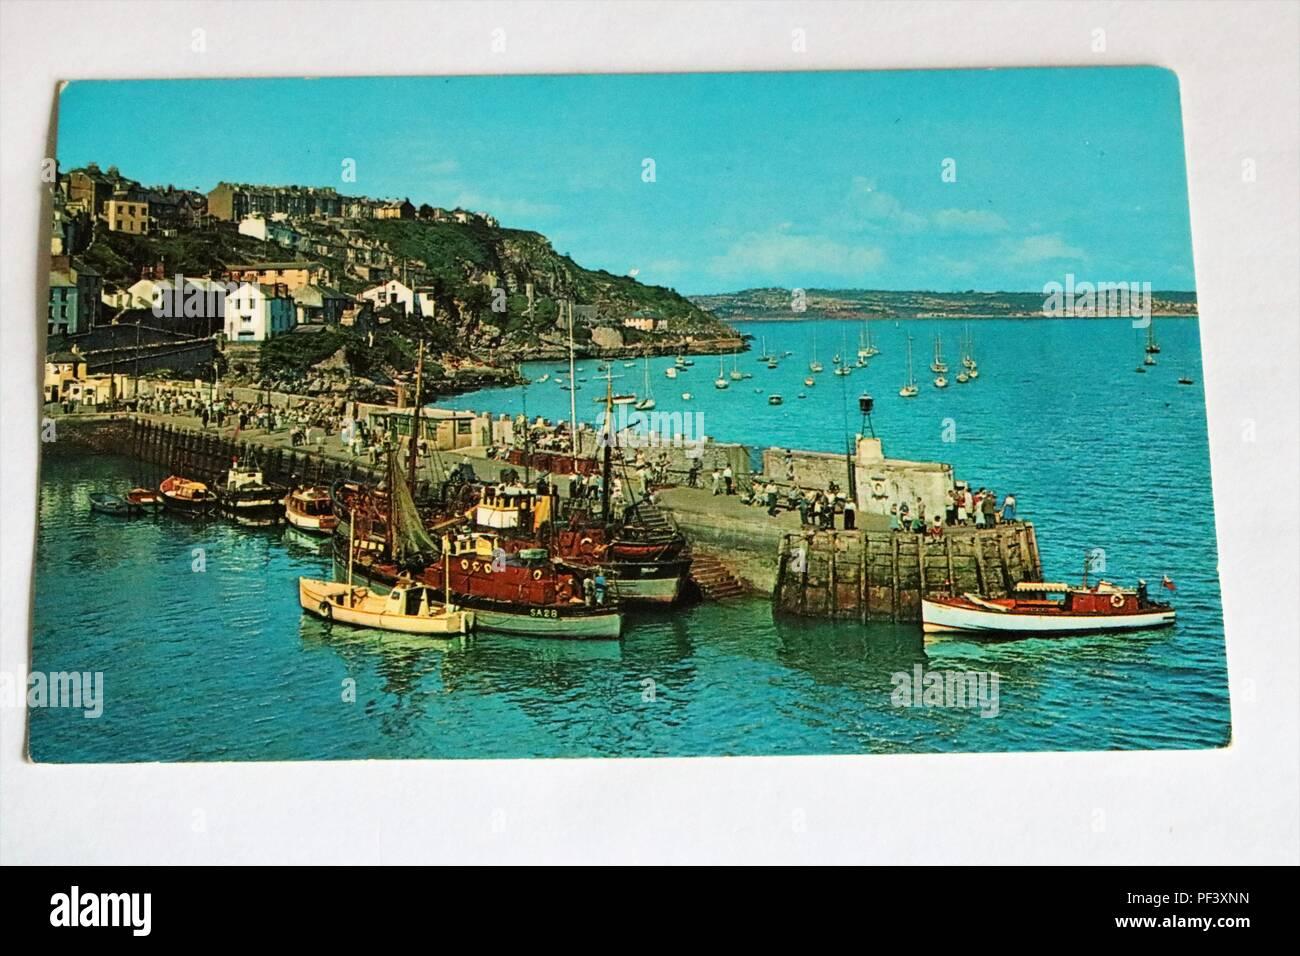 1960s 1970s colour photo postcard of The Pier, Brixham, Devon, UK - Social History - Stock Image